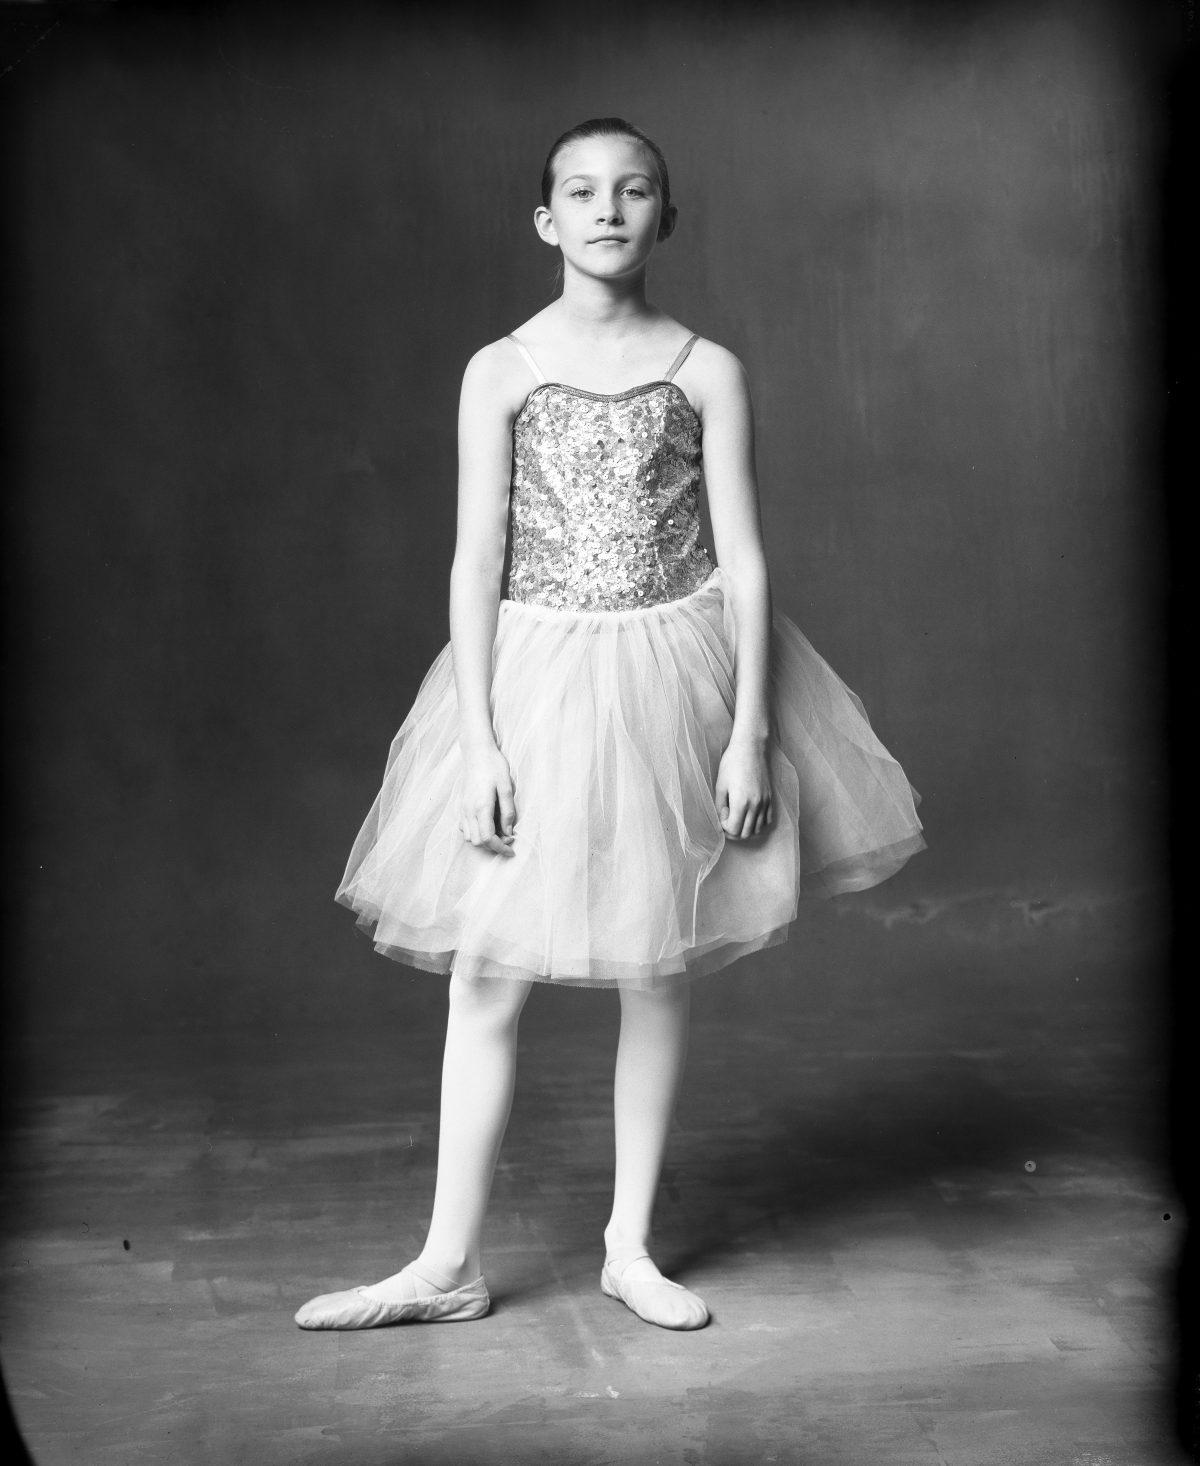 new 55 film polaroid by nicole caldwell ballet dancer